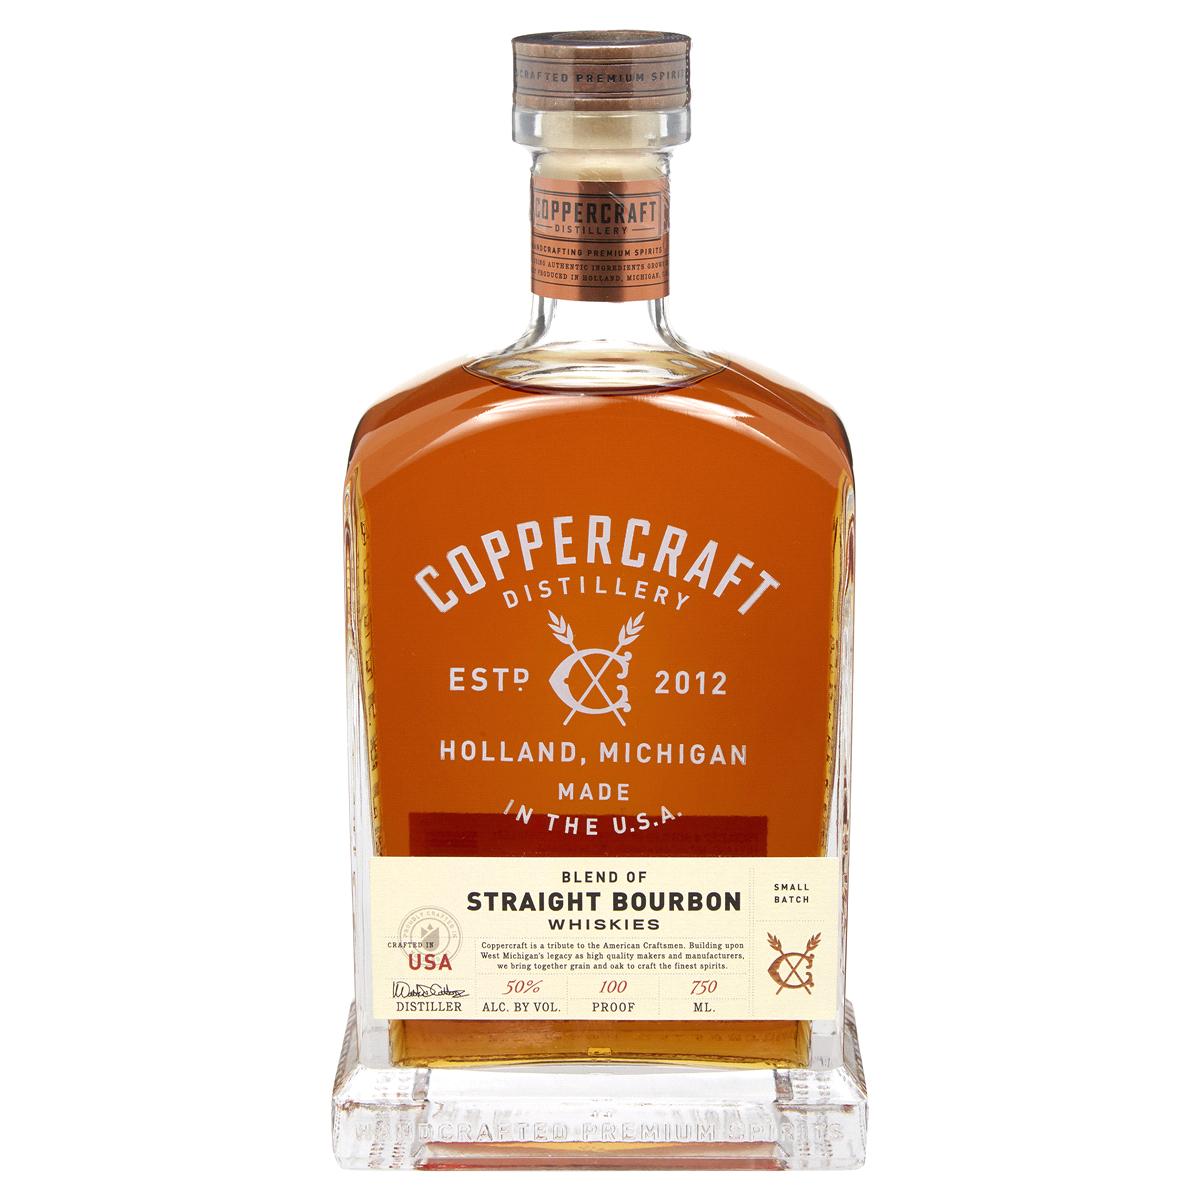 Coppercraft Straight Bourbon Whiskey 750ml